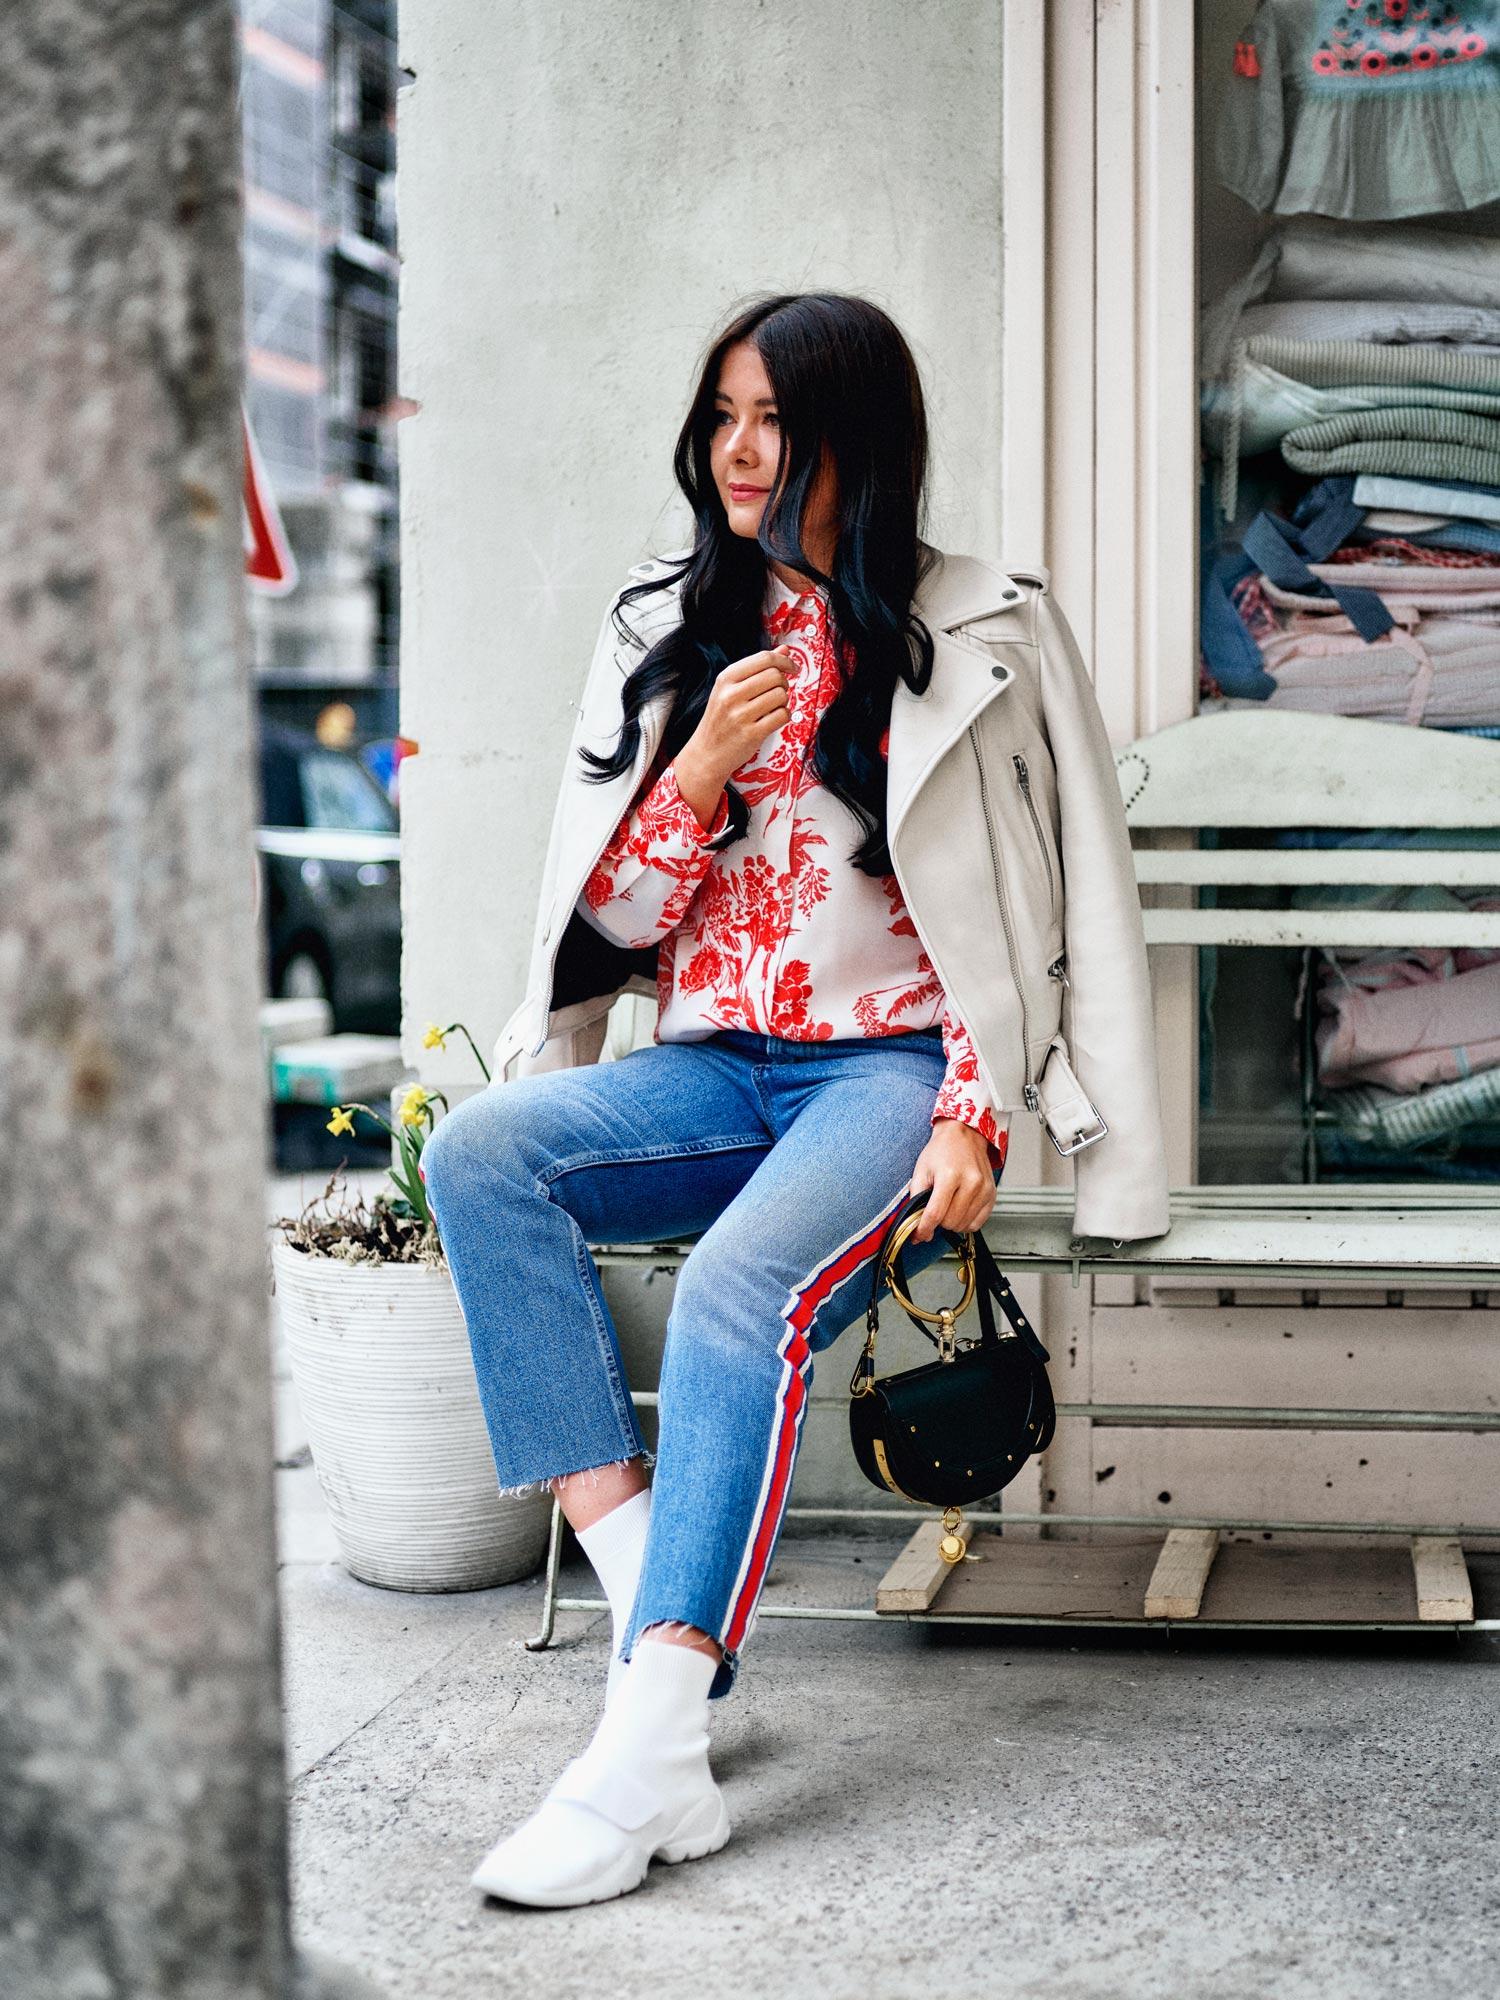 fashion-blogger-aus-muenchen-fashionblogger-lifestyleblogger-beautyblogger-fashion-blogger-modeblogger-modeblog-munich-blog-muenchen-trend-sneaker-mesh-sneaker